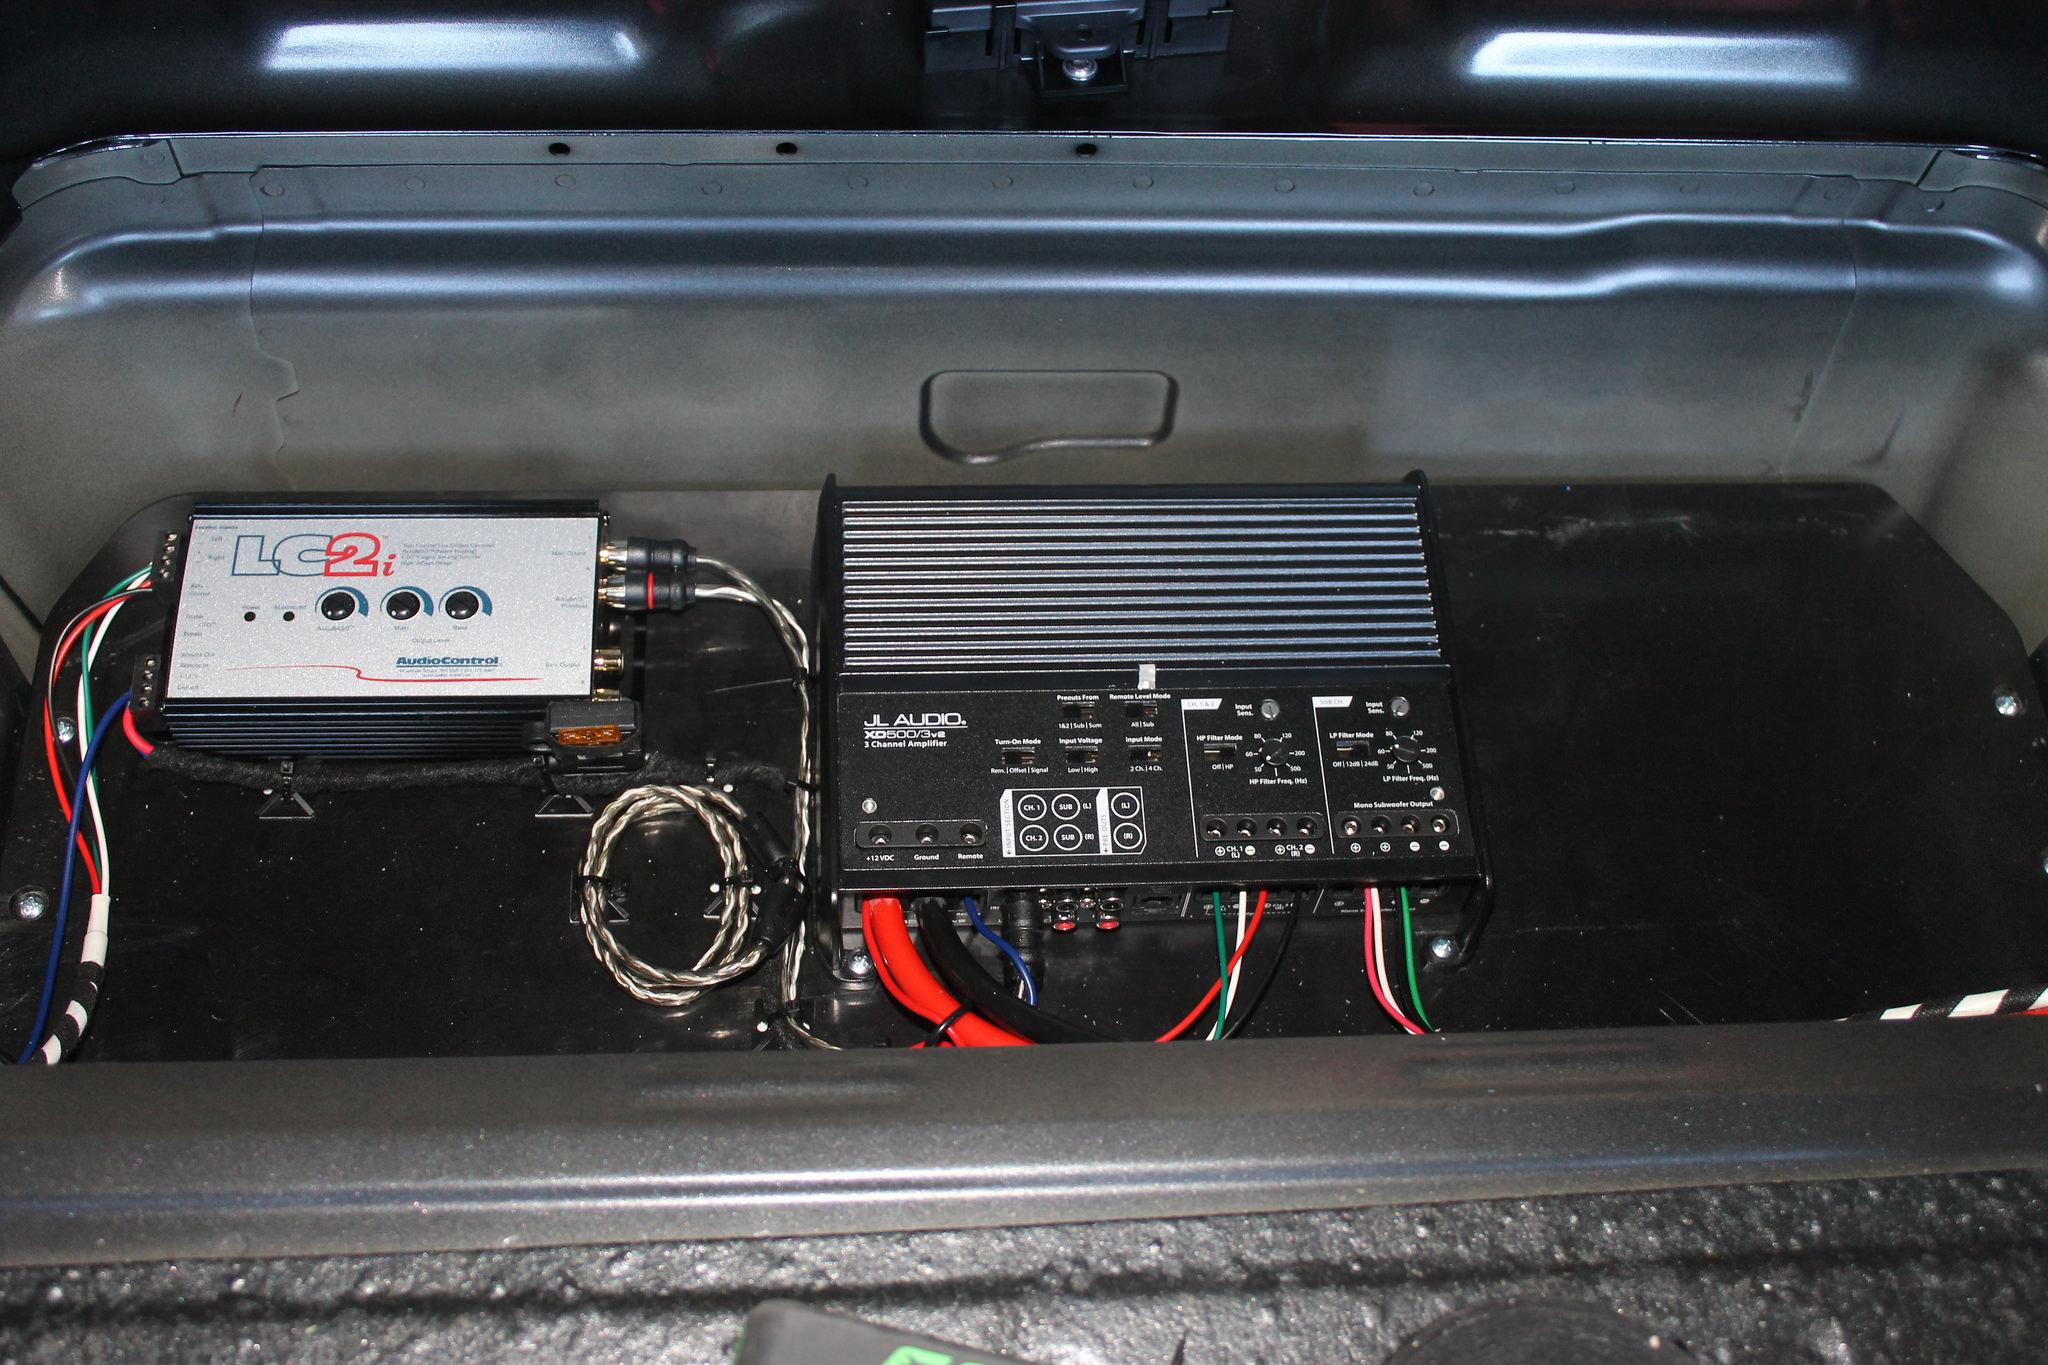 Astounding F30 F80 Full Bass Upgrade Level One Musicar Certified Sound Wiring Digital Resources Zidurslowmaporg